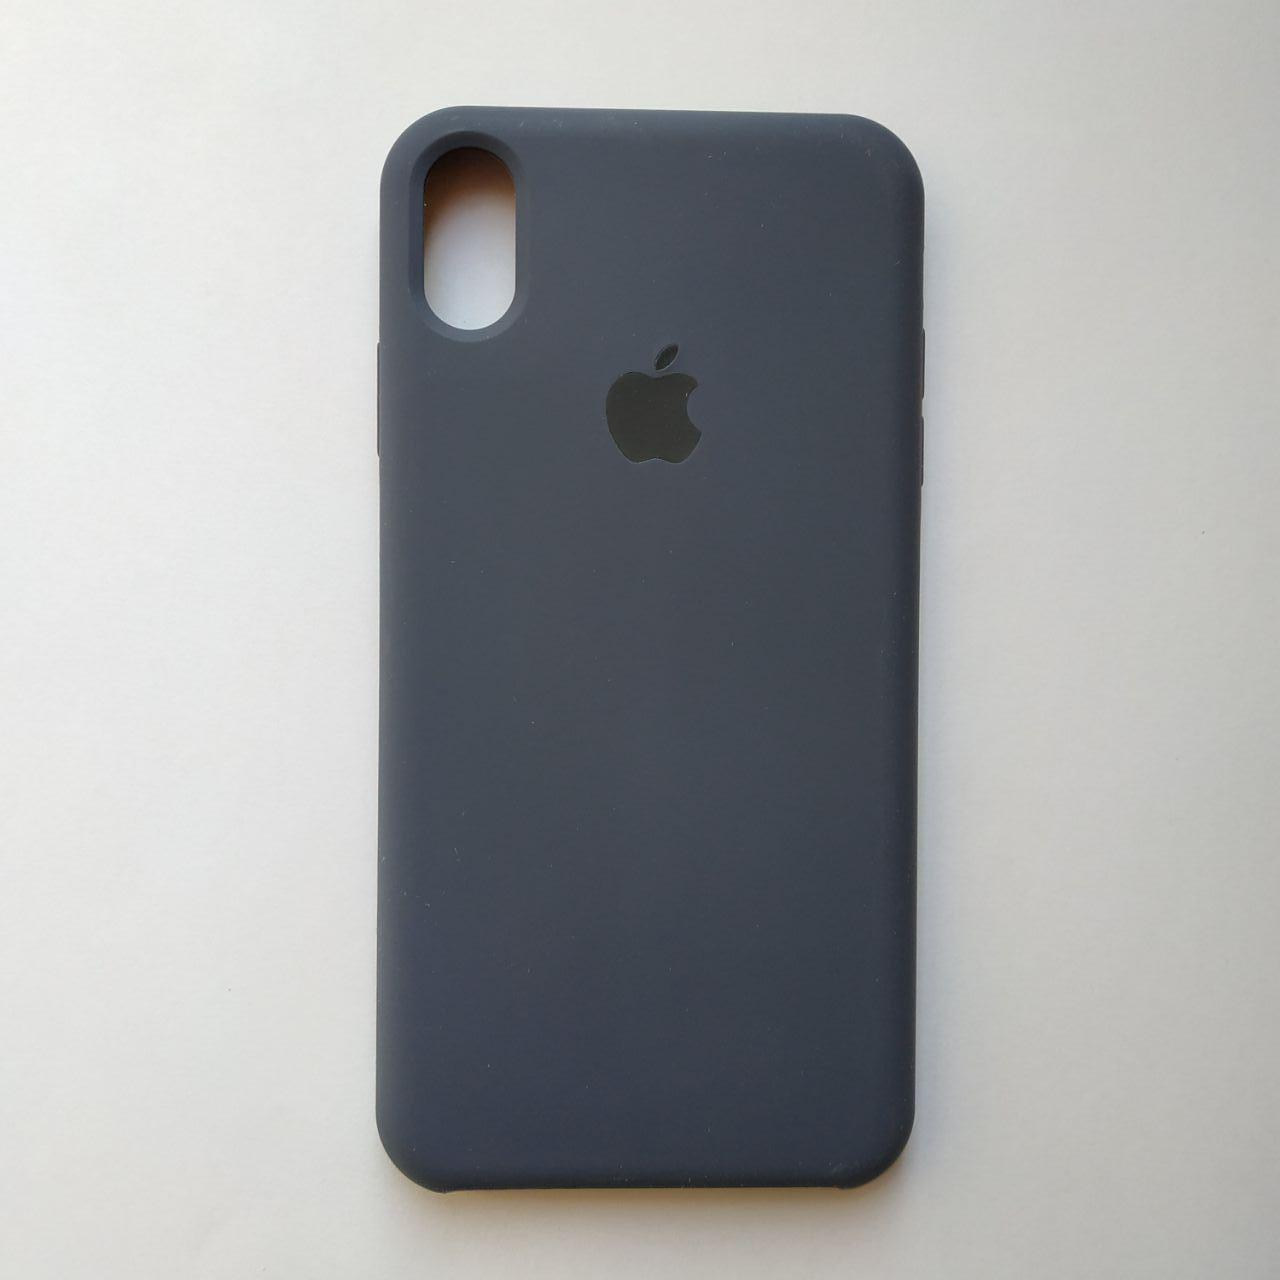 Накладка Silicone Case ARM для Apple iPhone XS Max Midnight blue